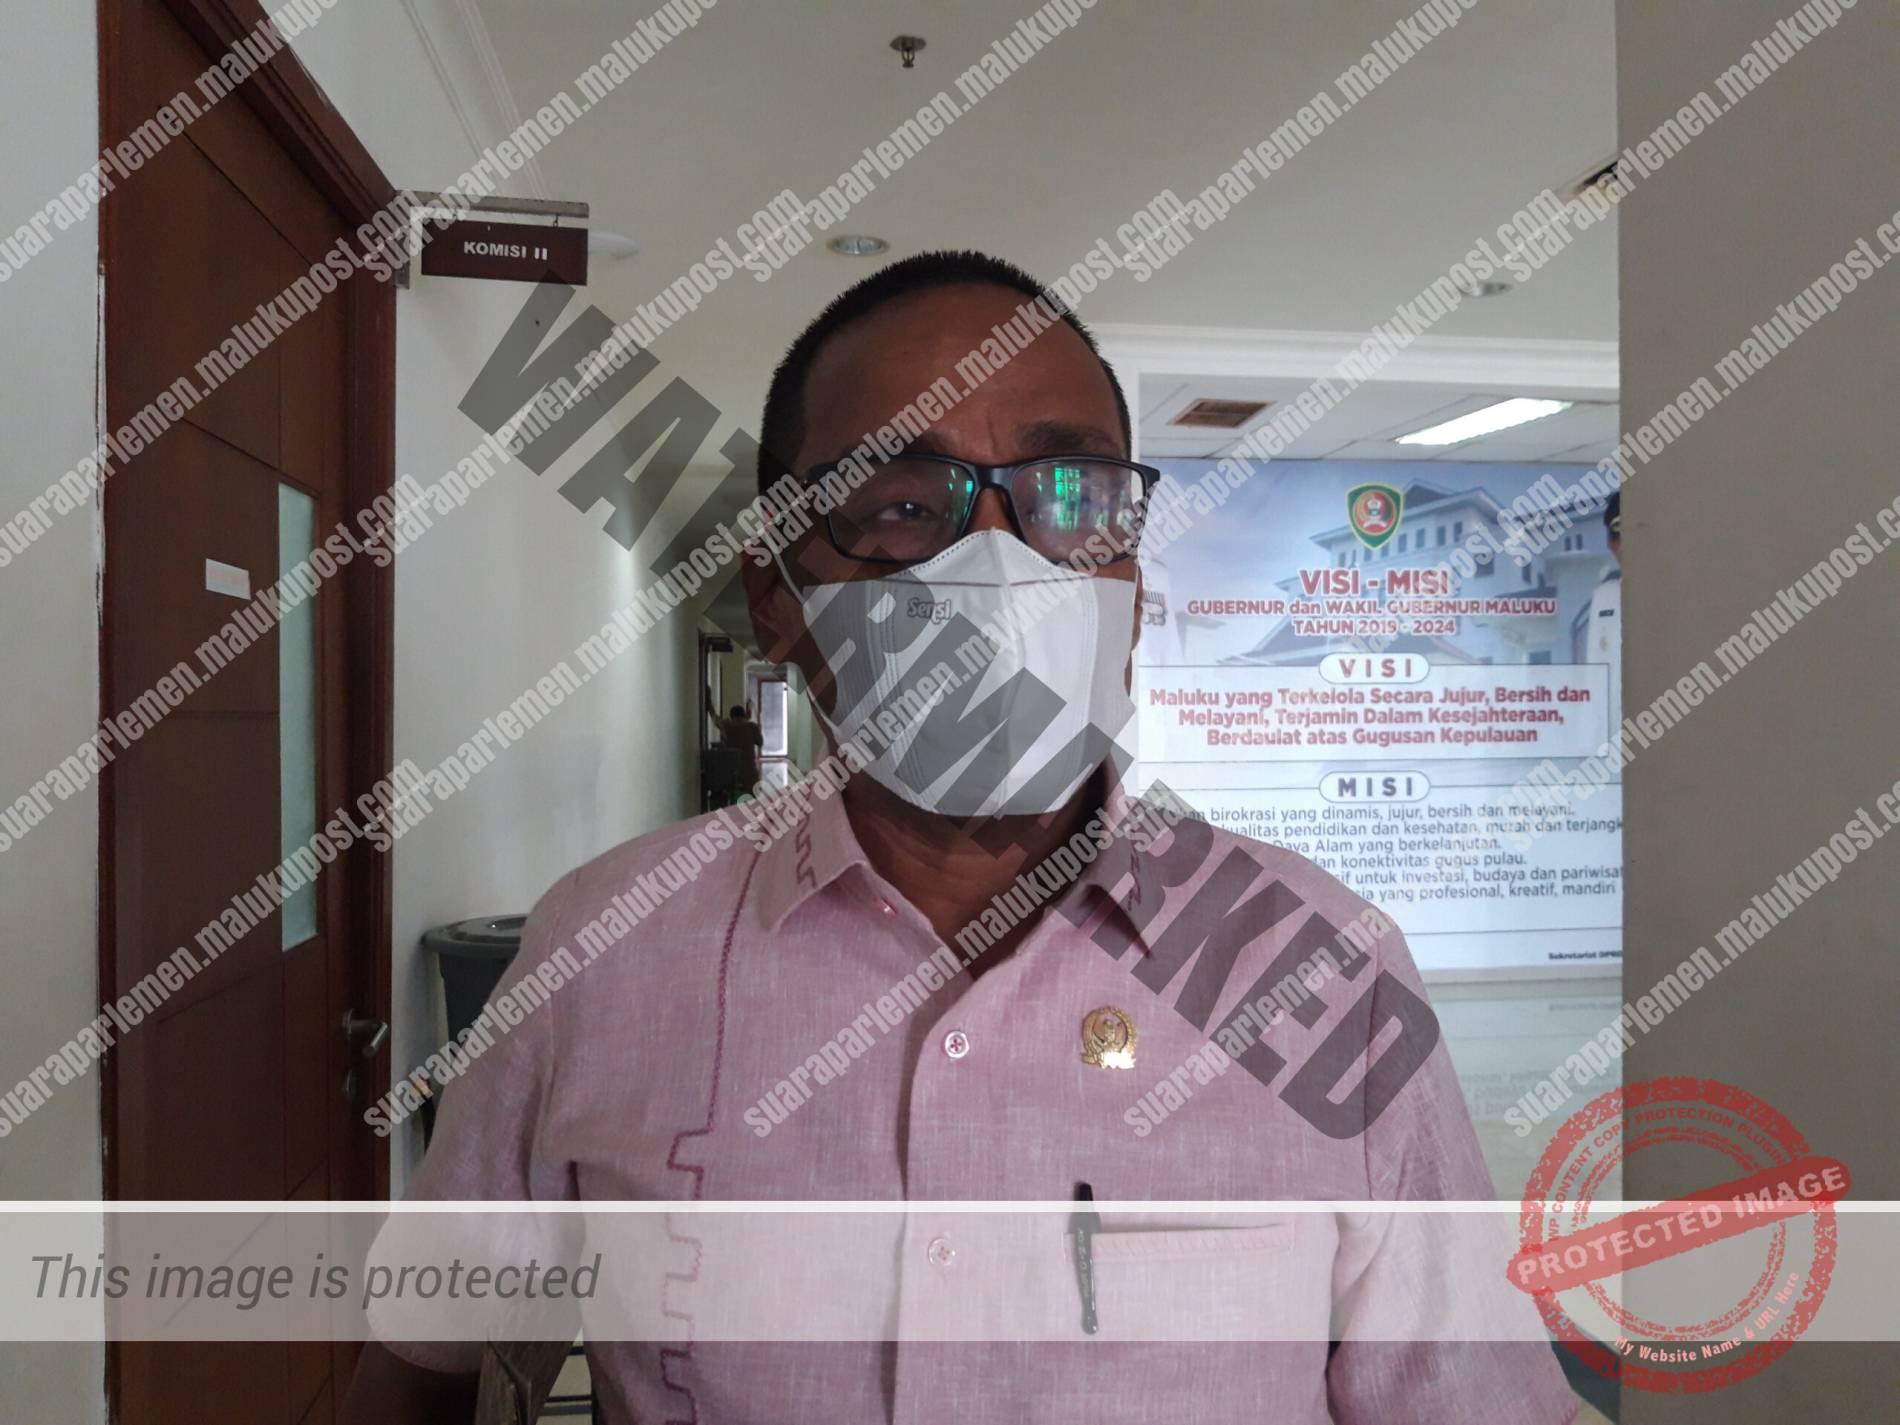 Ketua Bapemperda DPRD Maluku, Edison Sarimanella